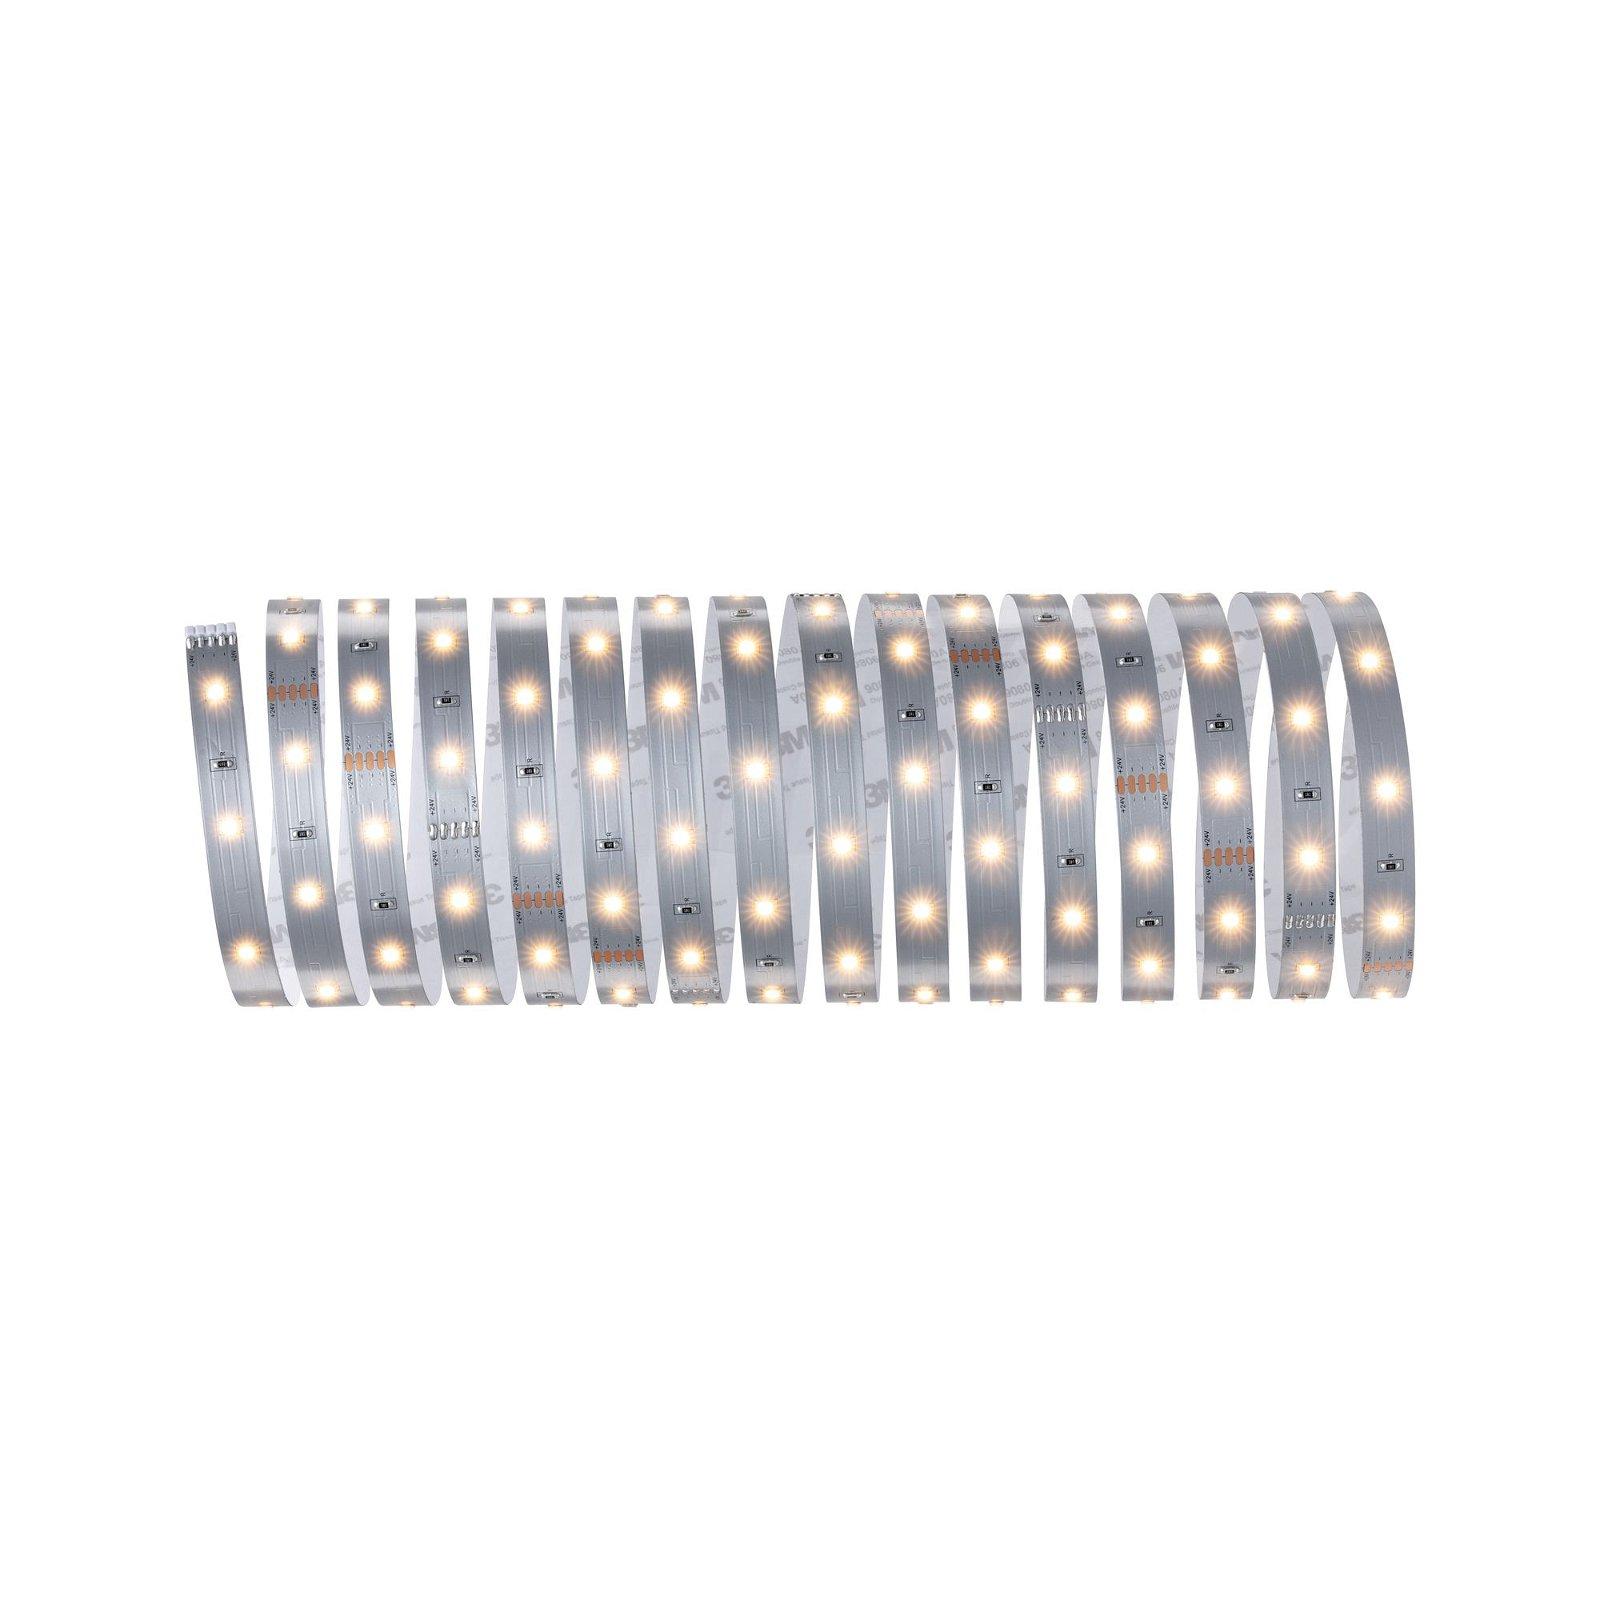 MaxLED 250 LED Strip Warmweiß 5m 19W 1500lm 2700K